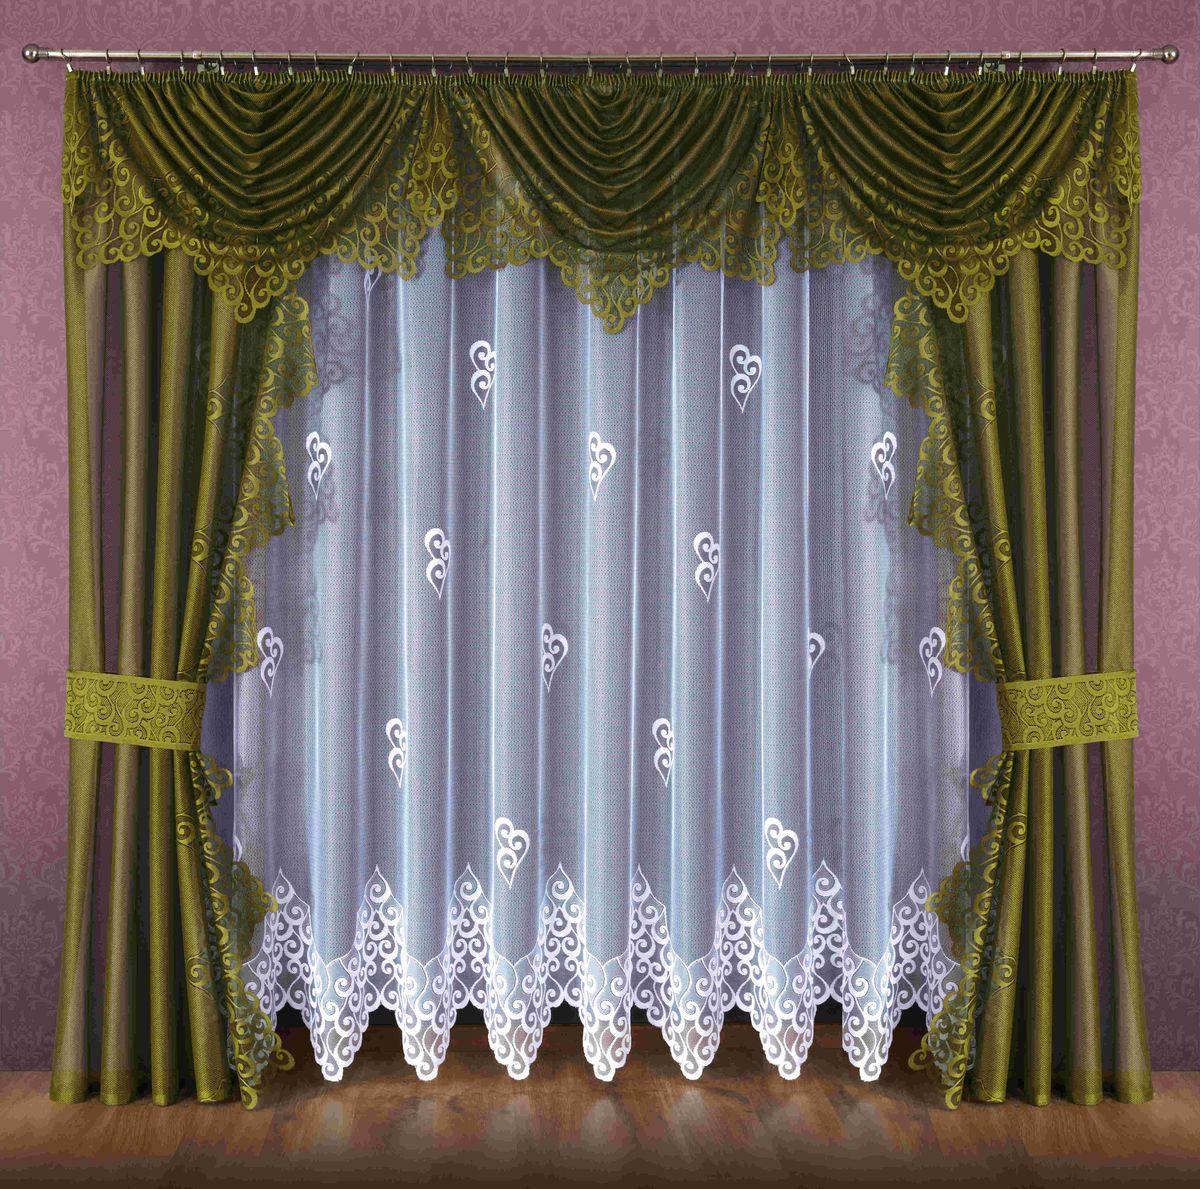 Комплект штор Wisan Ludmila, на ленте, цвет: белый, оливковый, высота 250 см комплект штор wisan lara на ленте цвет оранжевый белый высота 250 см